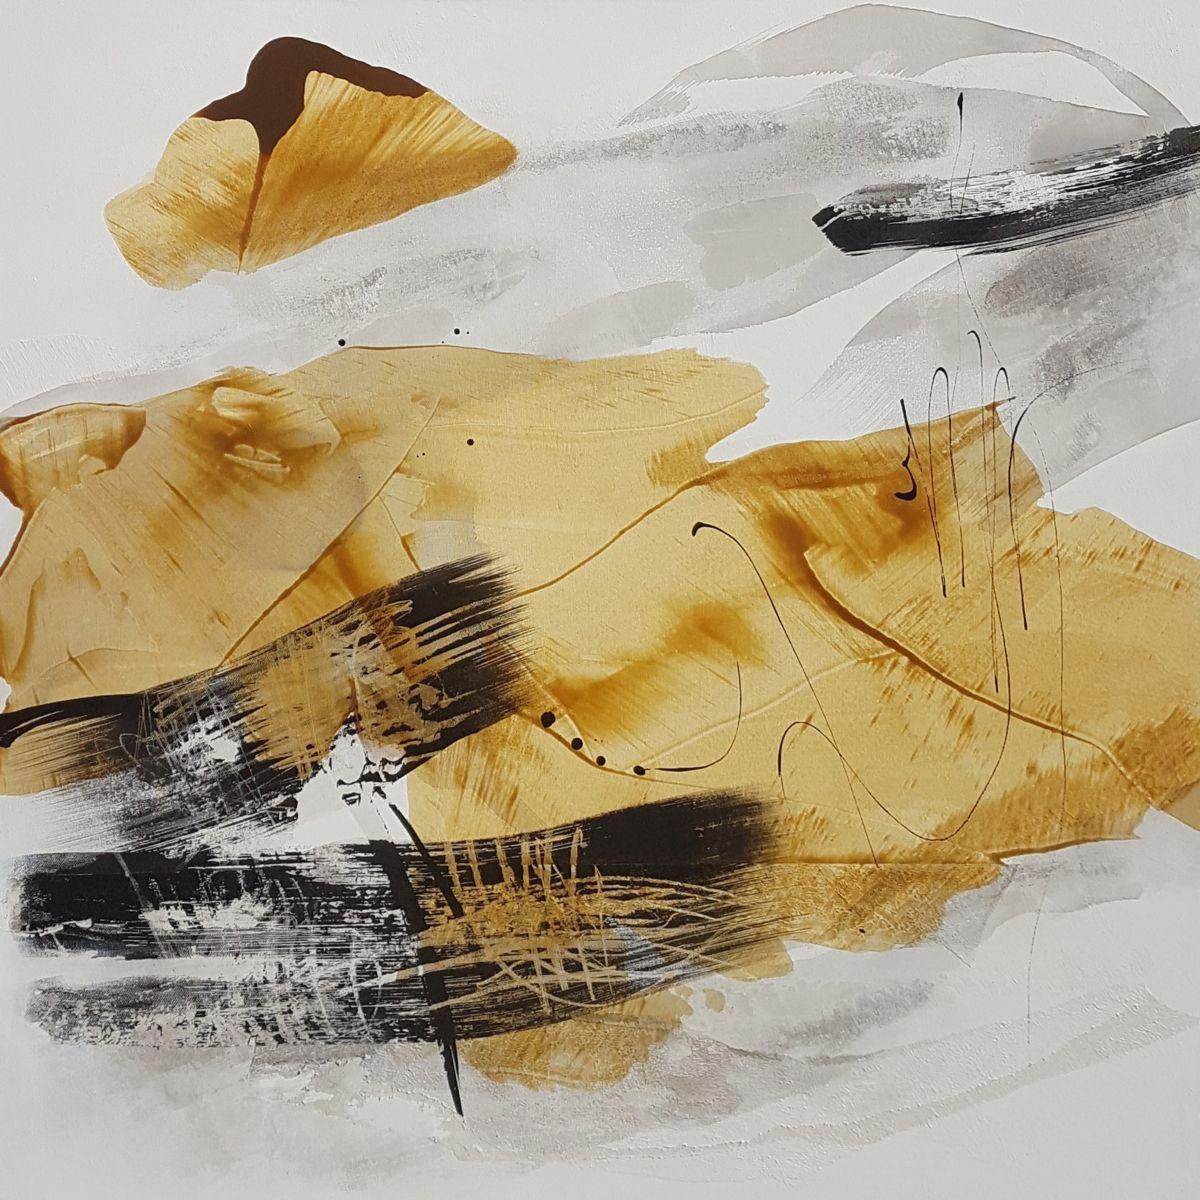 exposition, art, peinture, Oise, Coye-la-Forêt